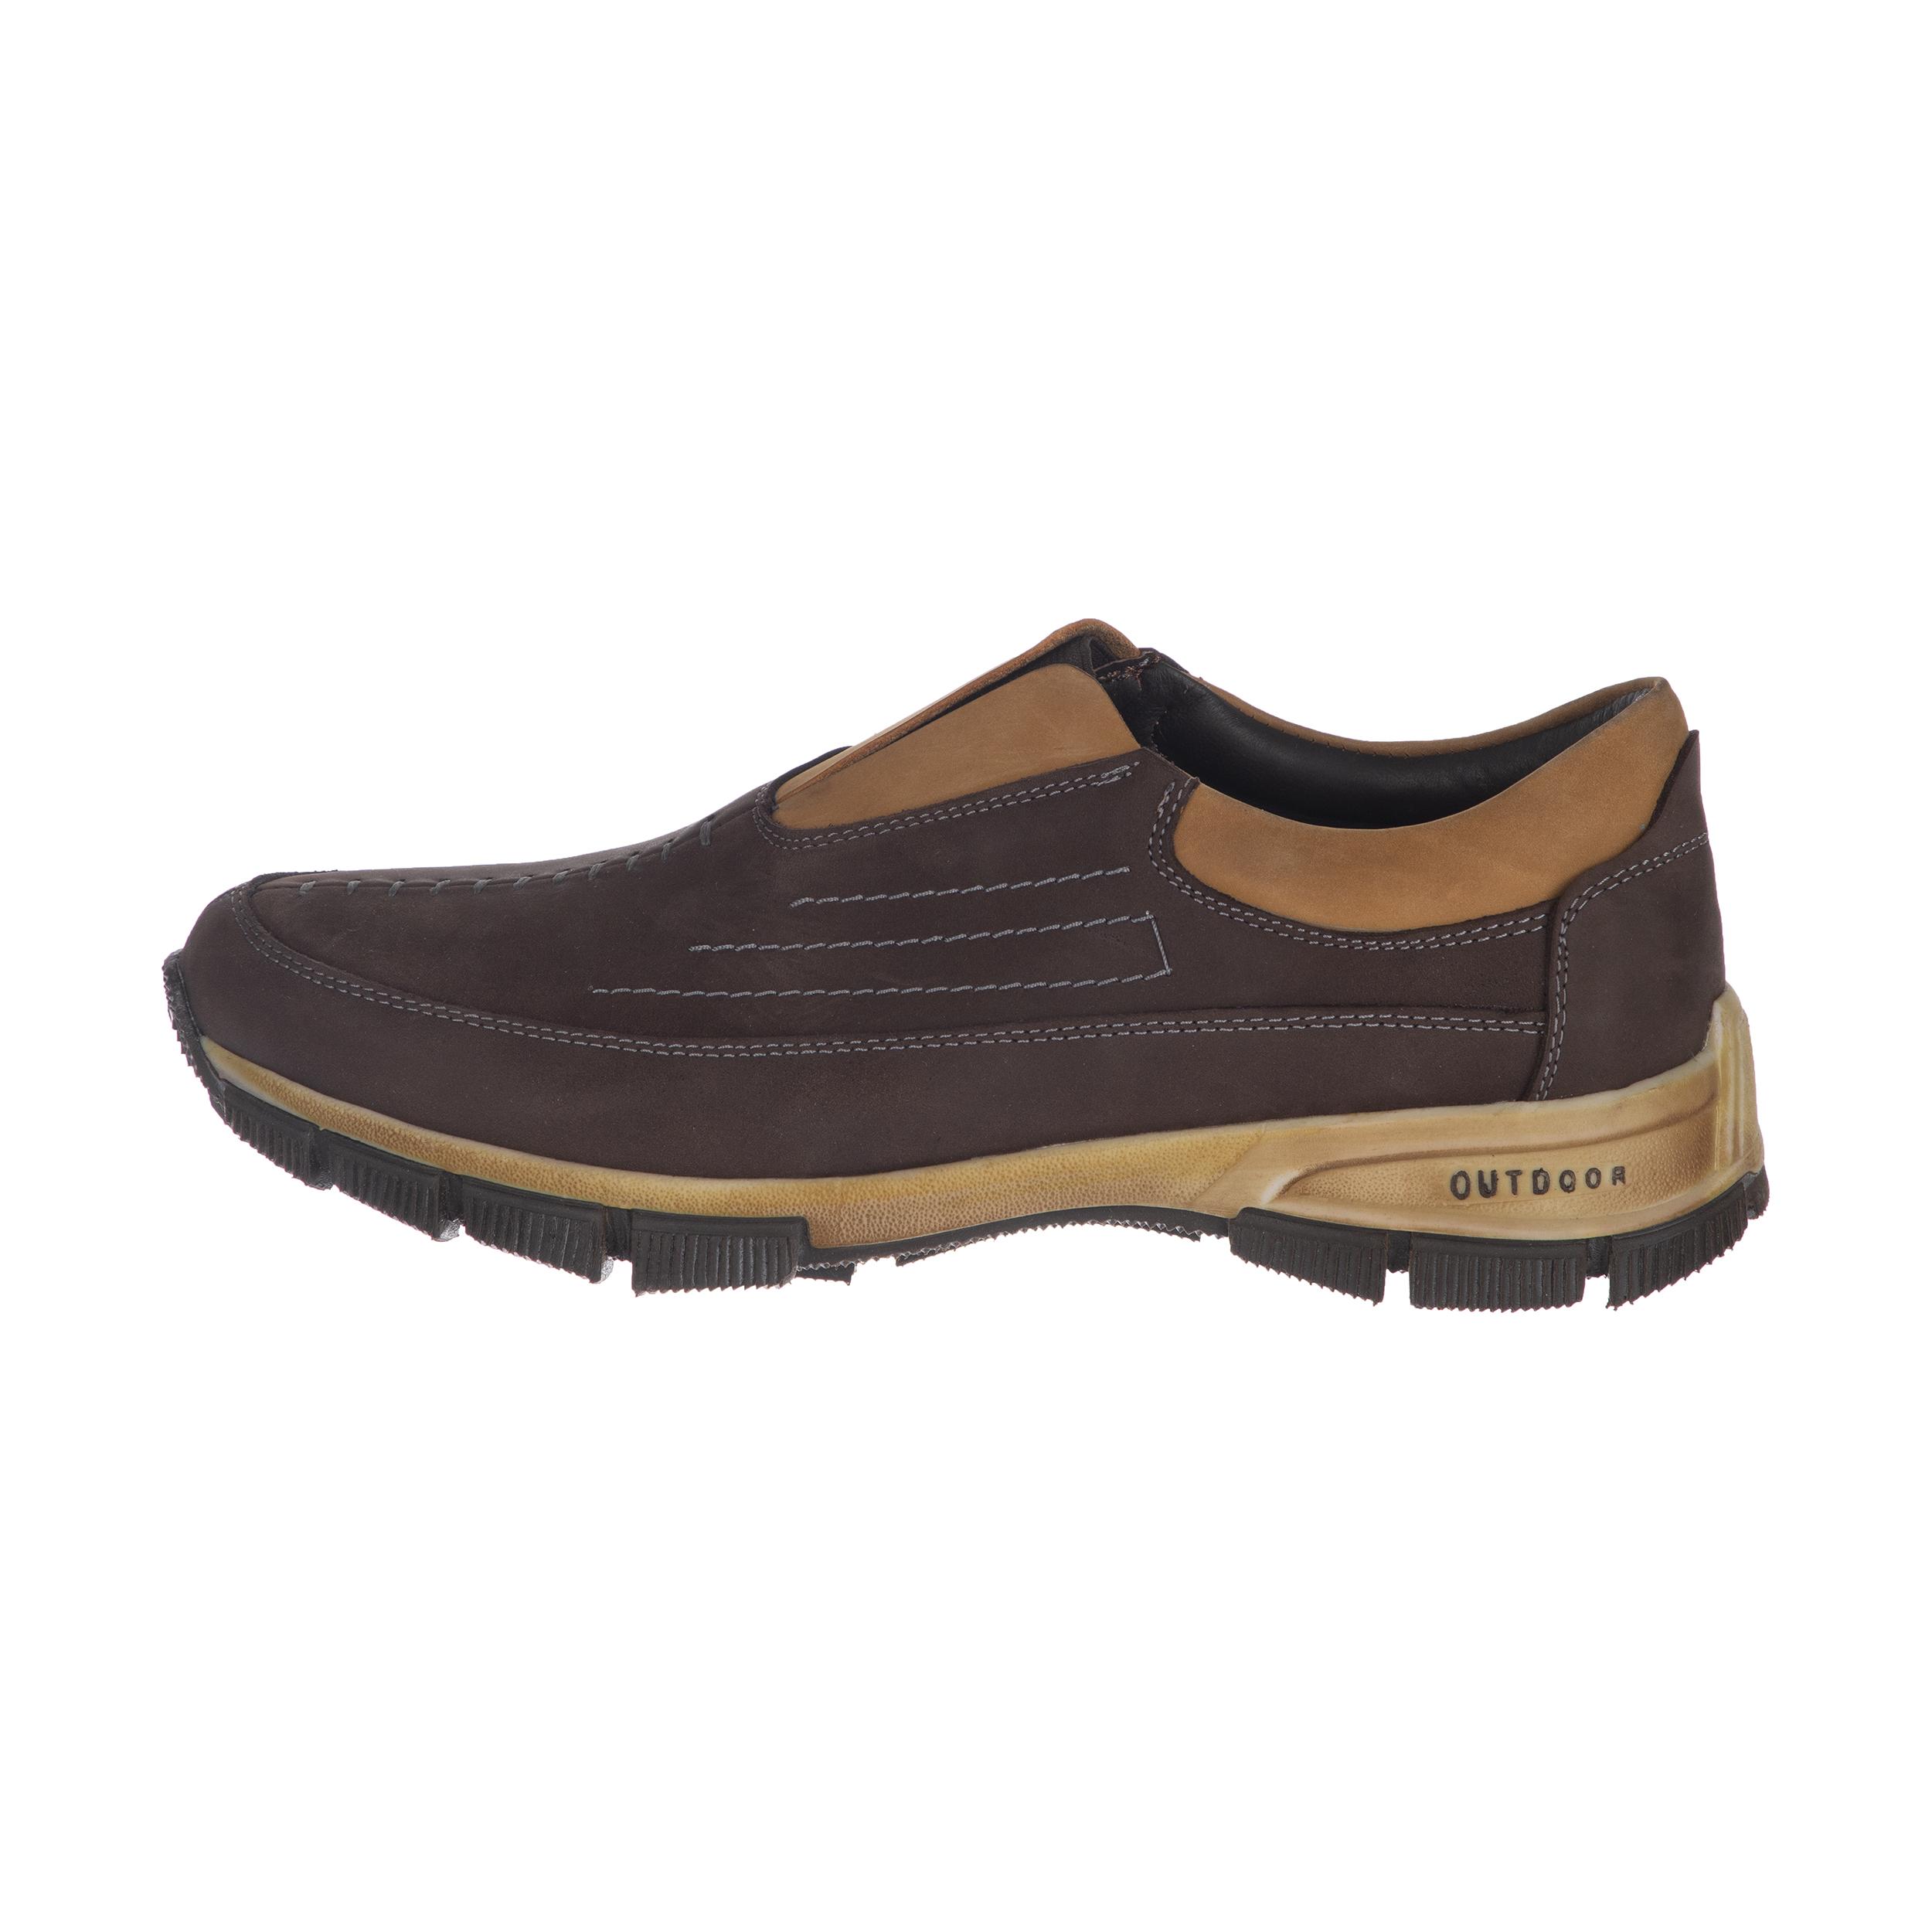 قیمت خرید کفش روزمره مردانه دانادل مدل 8604A503104 اورجینال